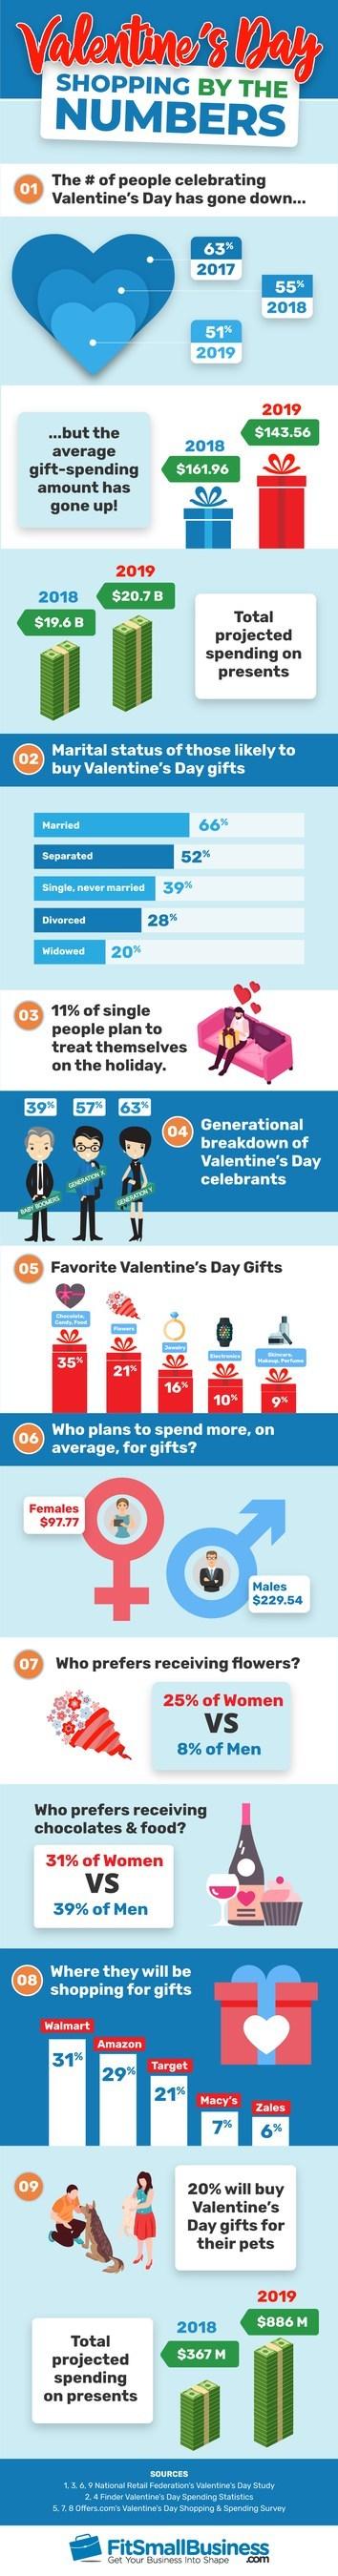 Valentine's Day Shopping Stats - FitSmallBusiness.com